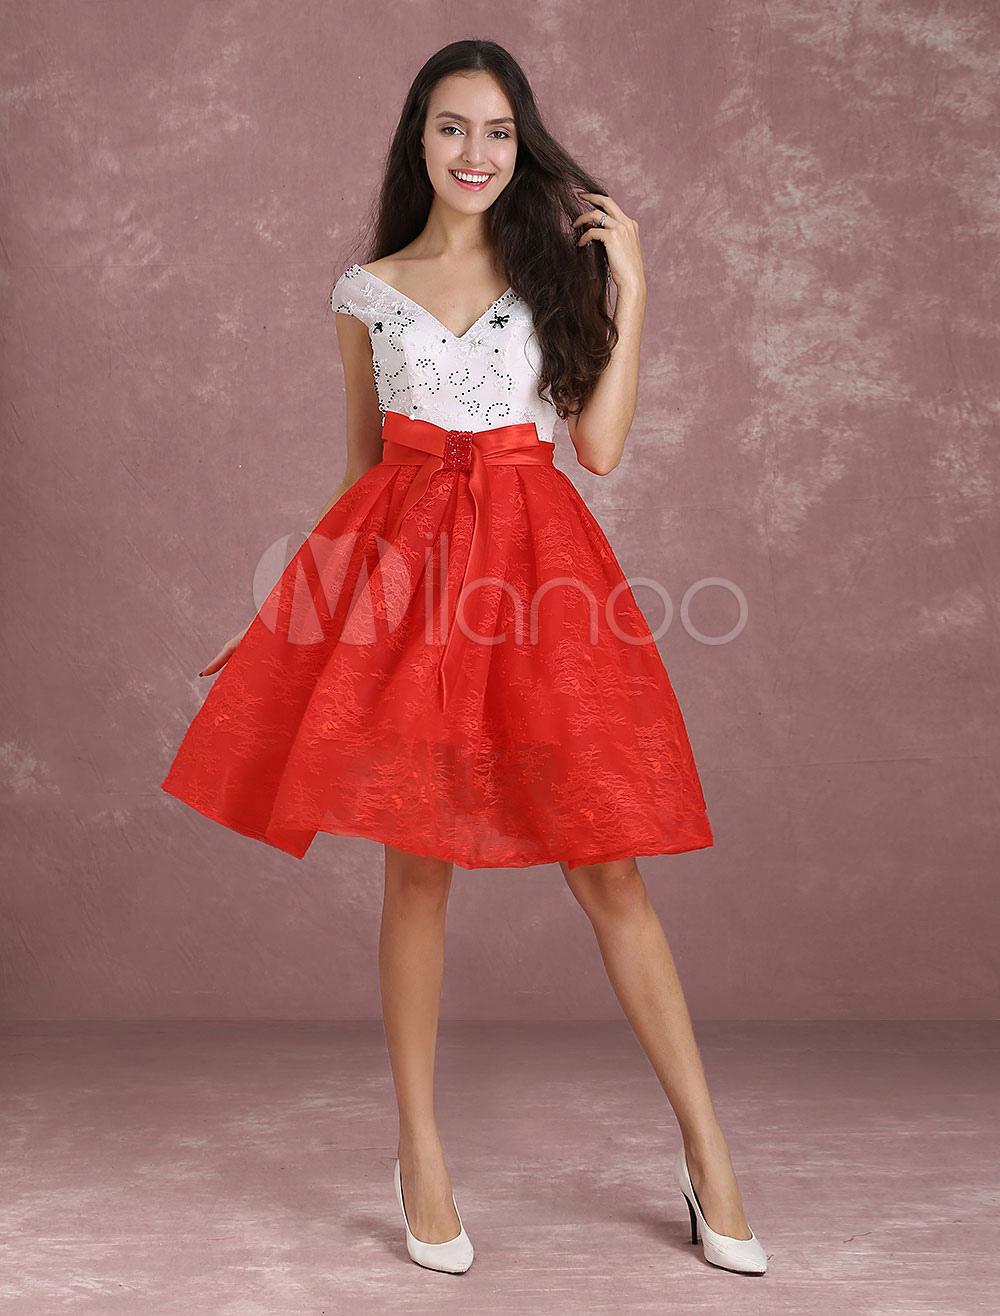 Lace Homecoming Dress Short Prom Dresses Two Tone Beading V Neck Bow Sash A Line Knee Length Graduation Dress